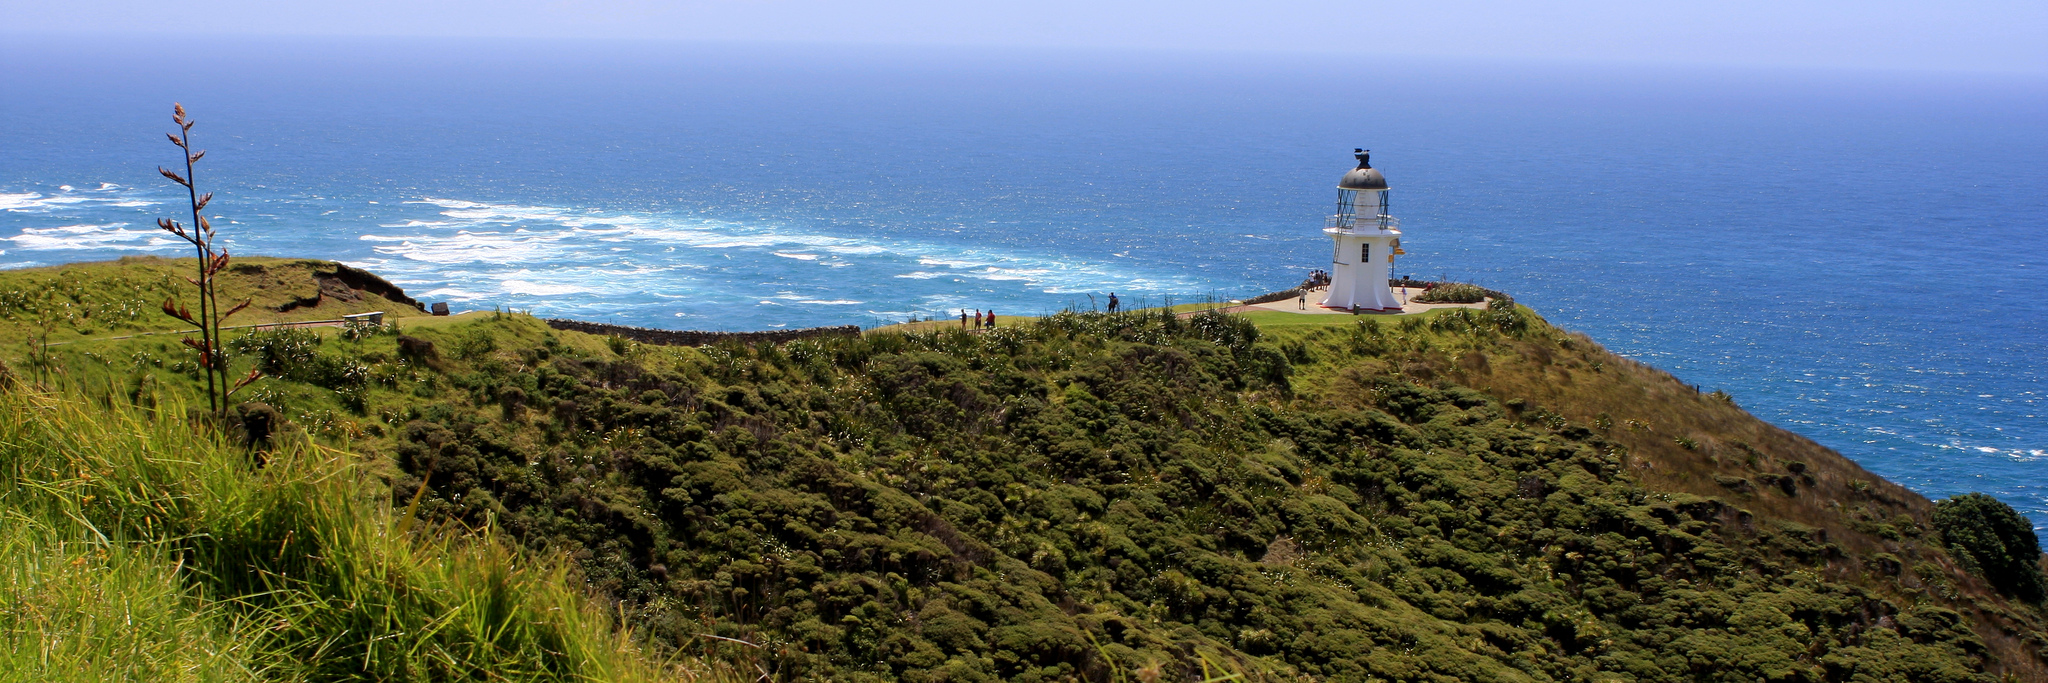 Spiritual Cape Reinga at the northern tip of New Zealand